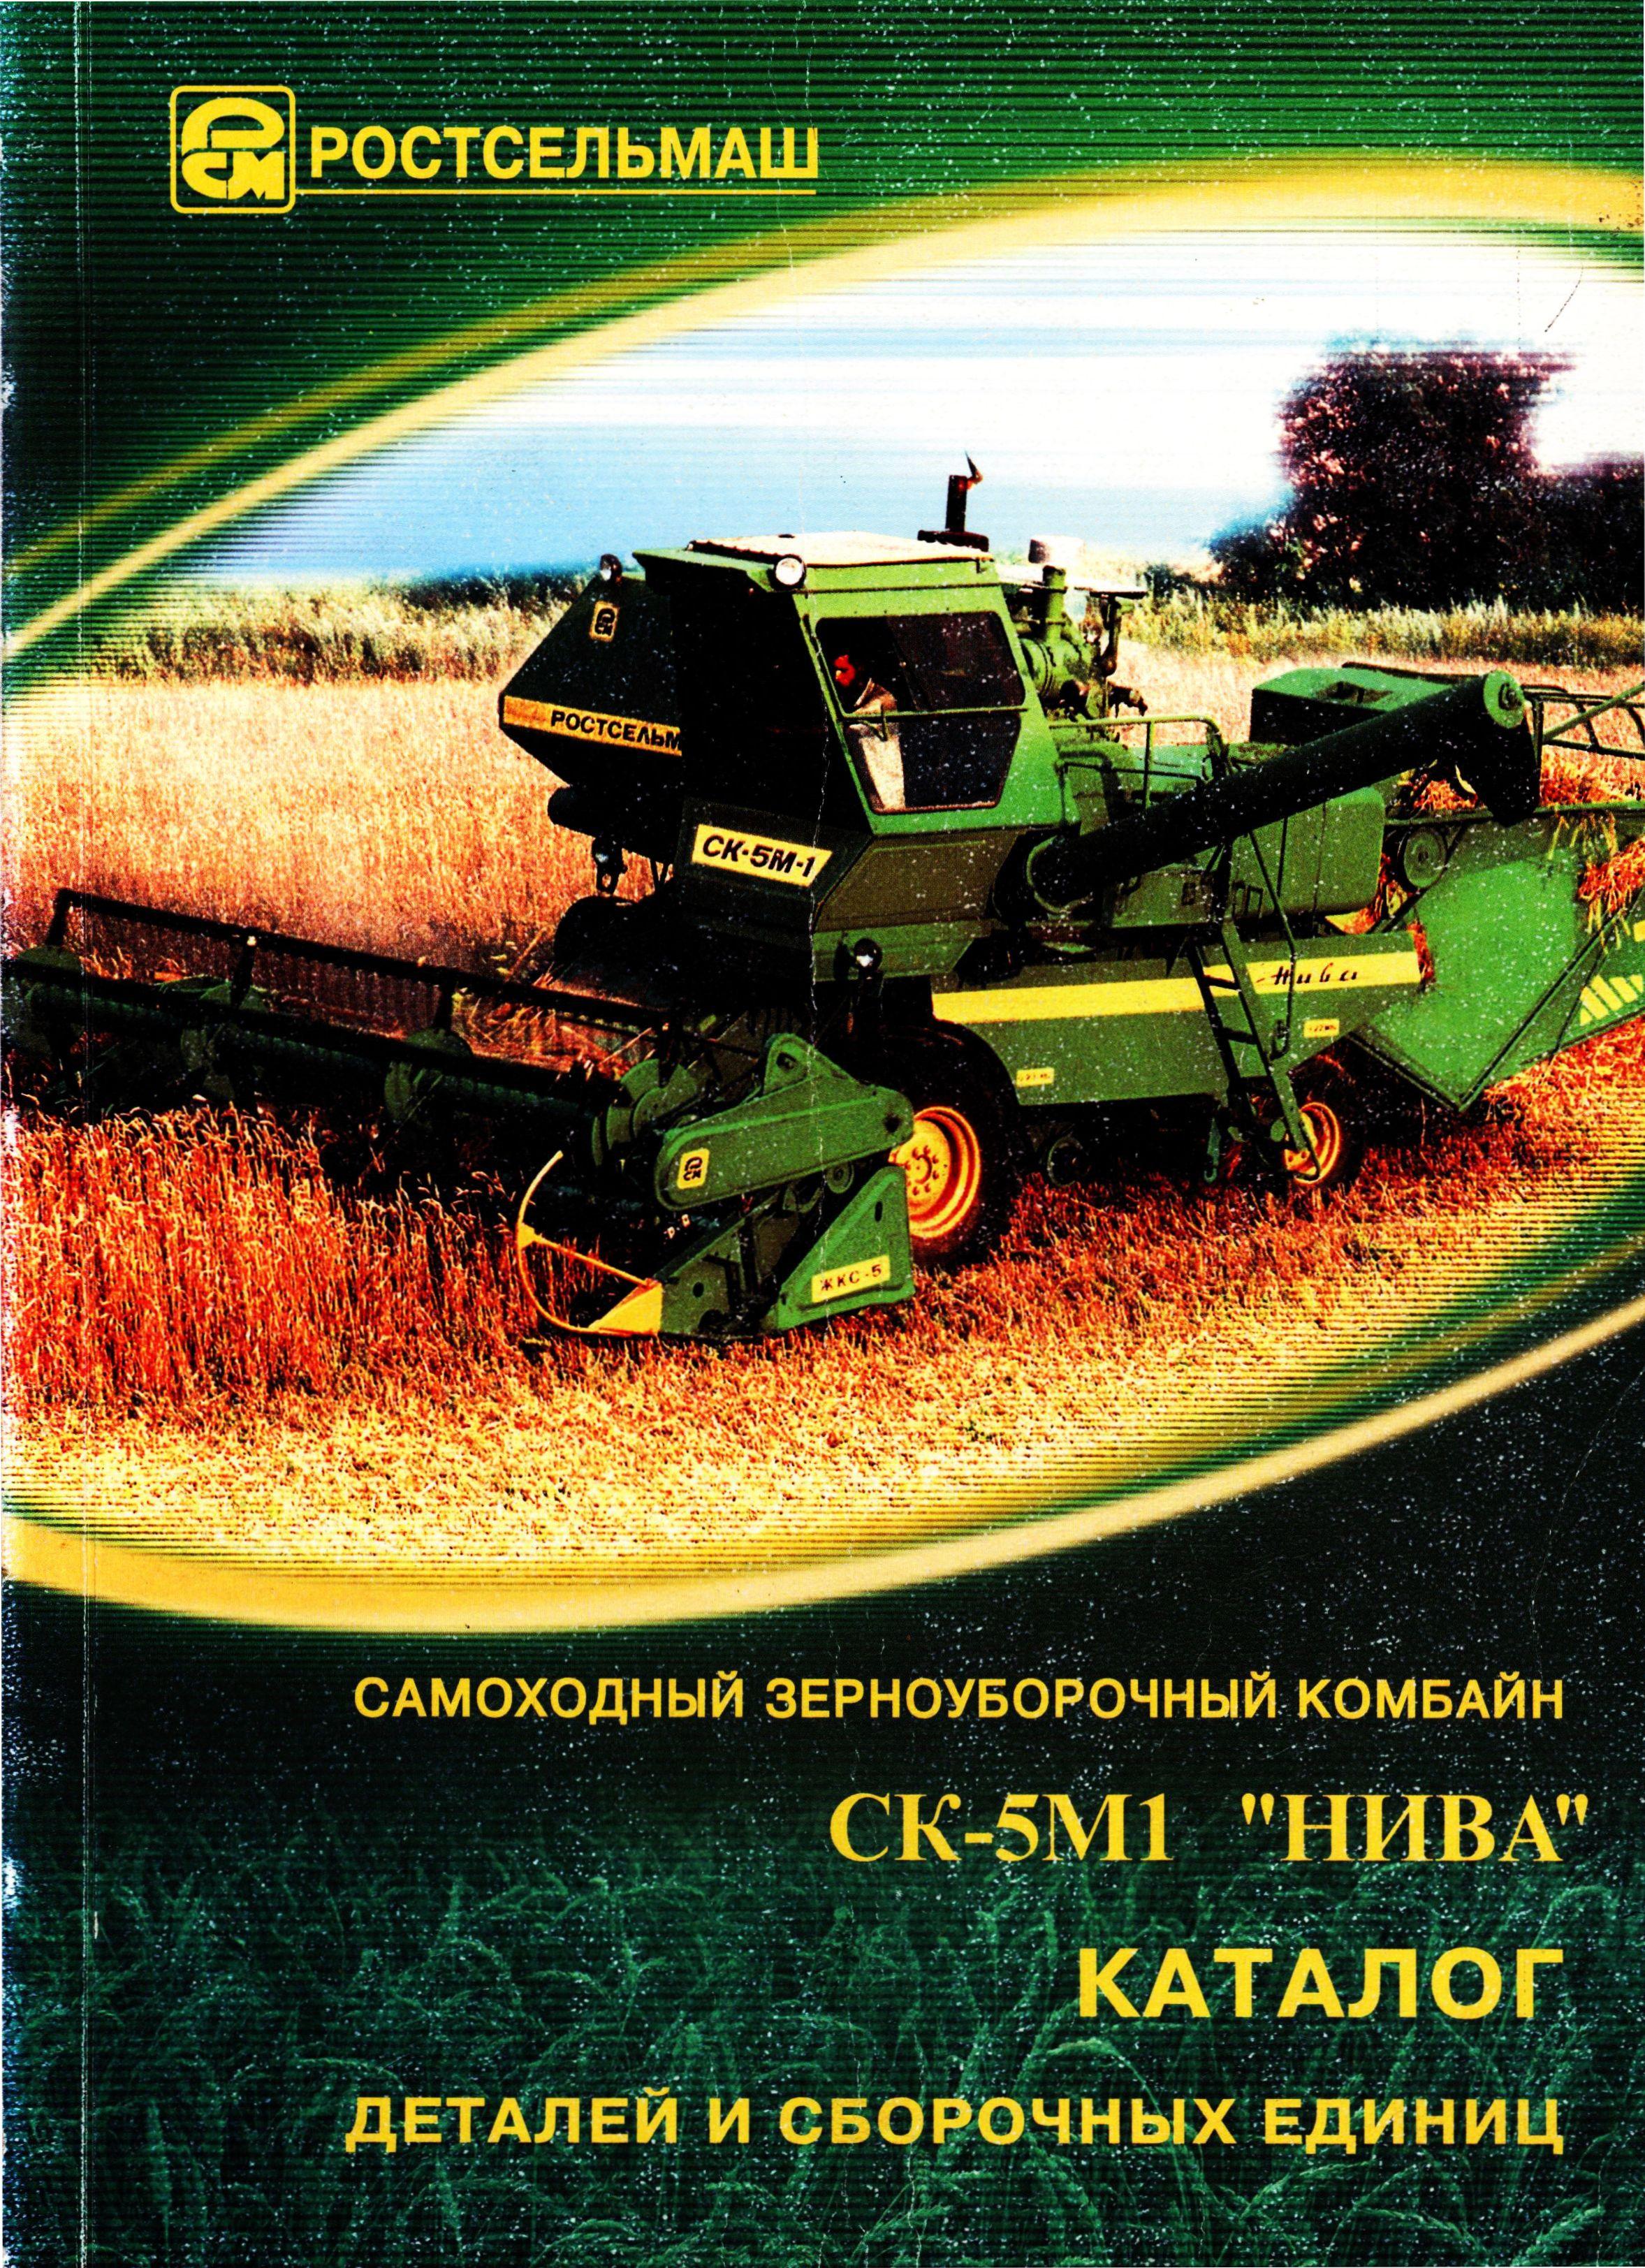 Самоходный зерноуборочный комбайн СК-5М1 «Нива». Каталог деталей